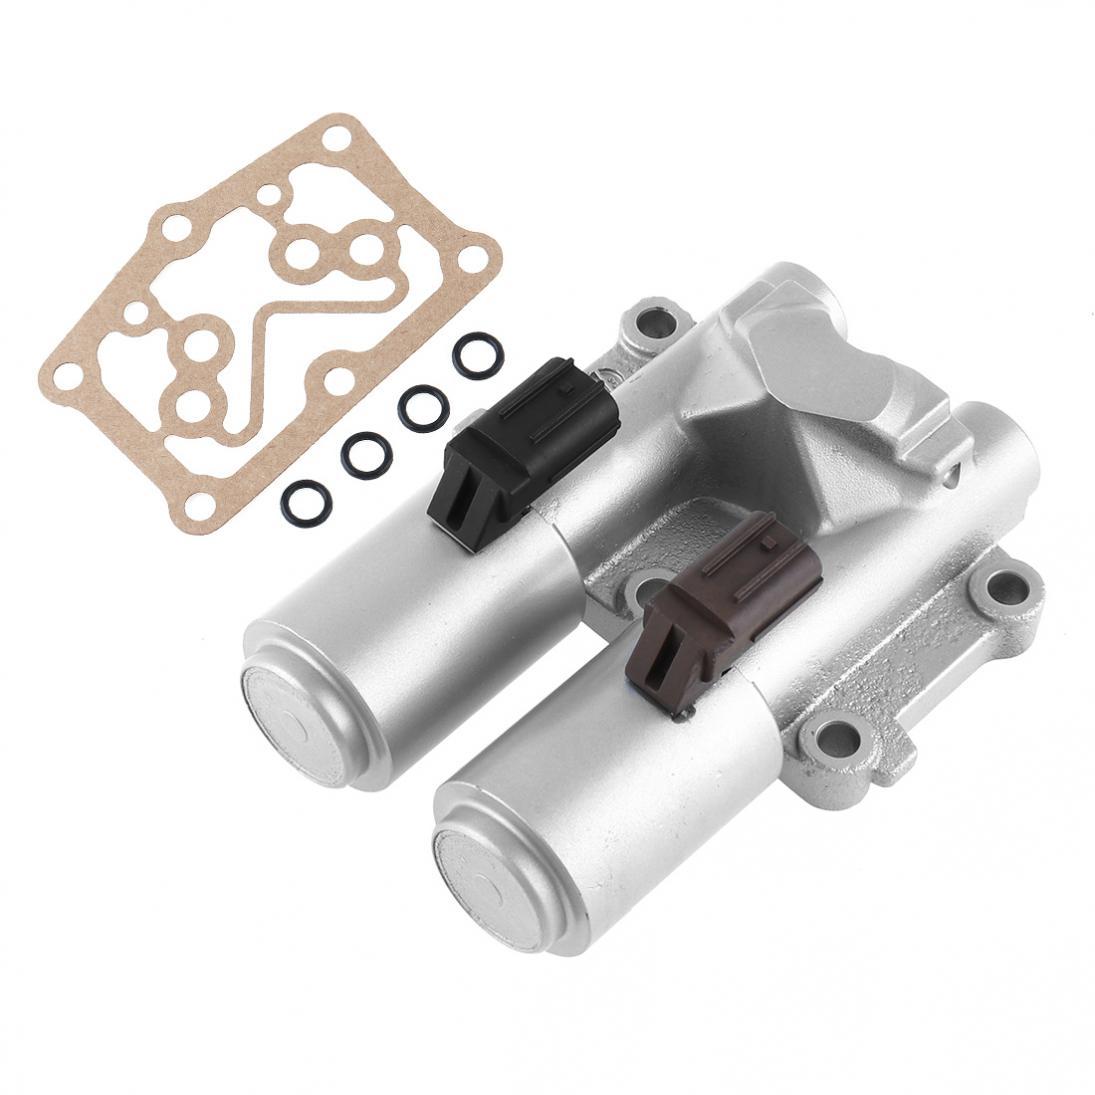 28260 RPC 004  Transmission Dual Linear Solenoid Automotive Tools for Honda Civic|Valves & Parts| |  - title=